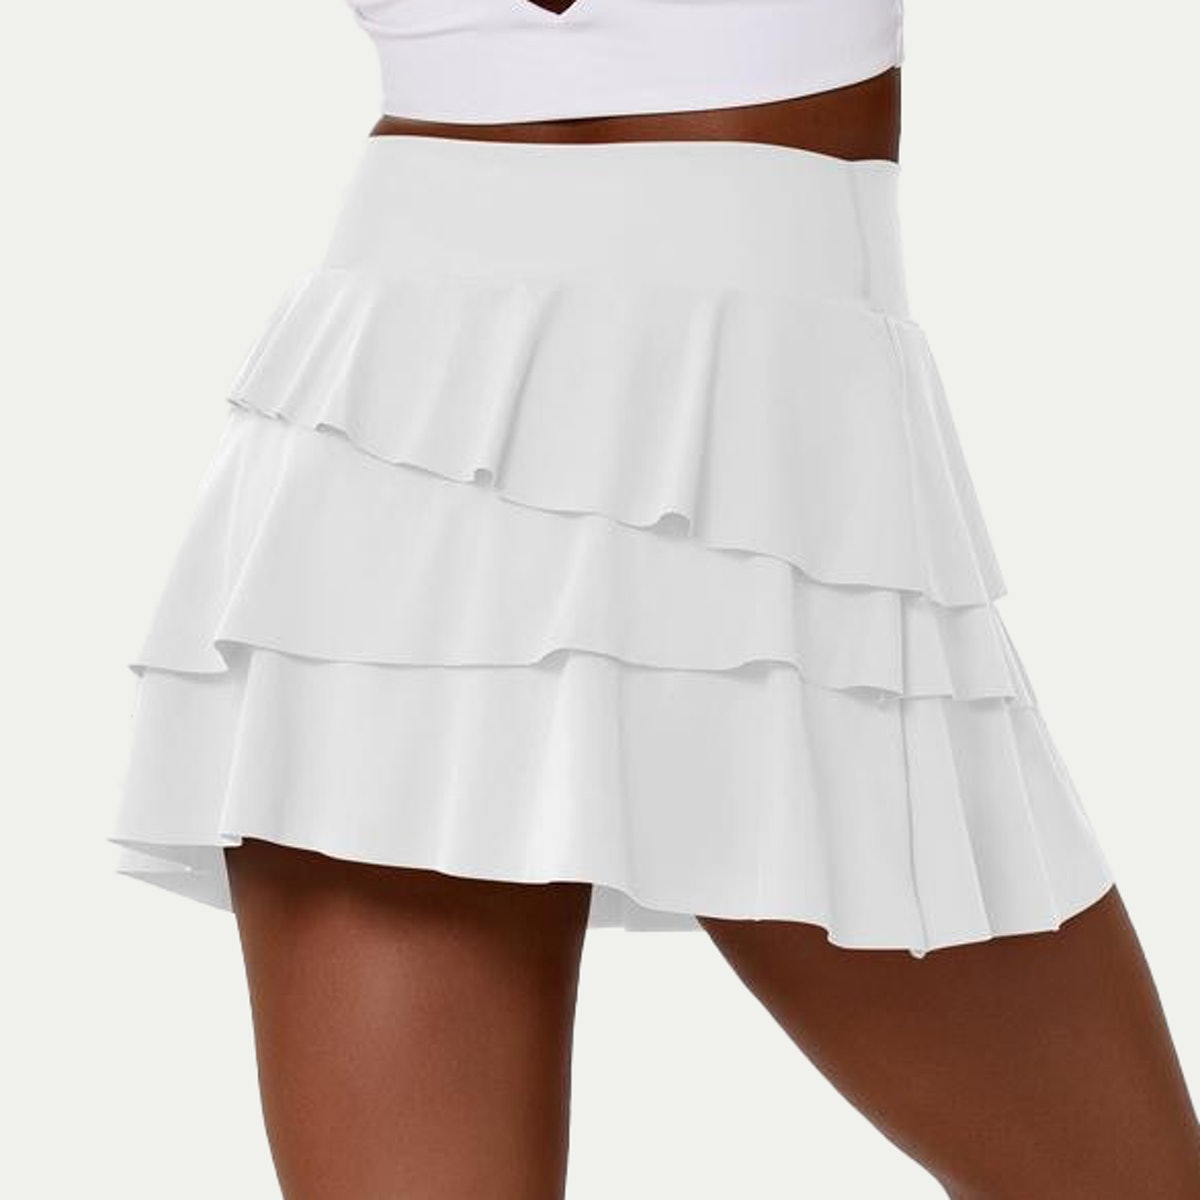 Everyday 2-in-1 Tennis Skirt -- Truffle